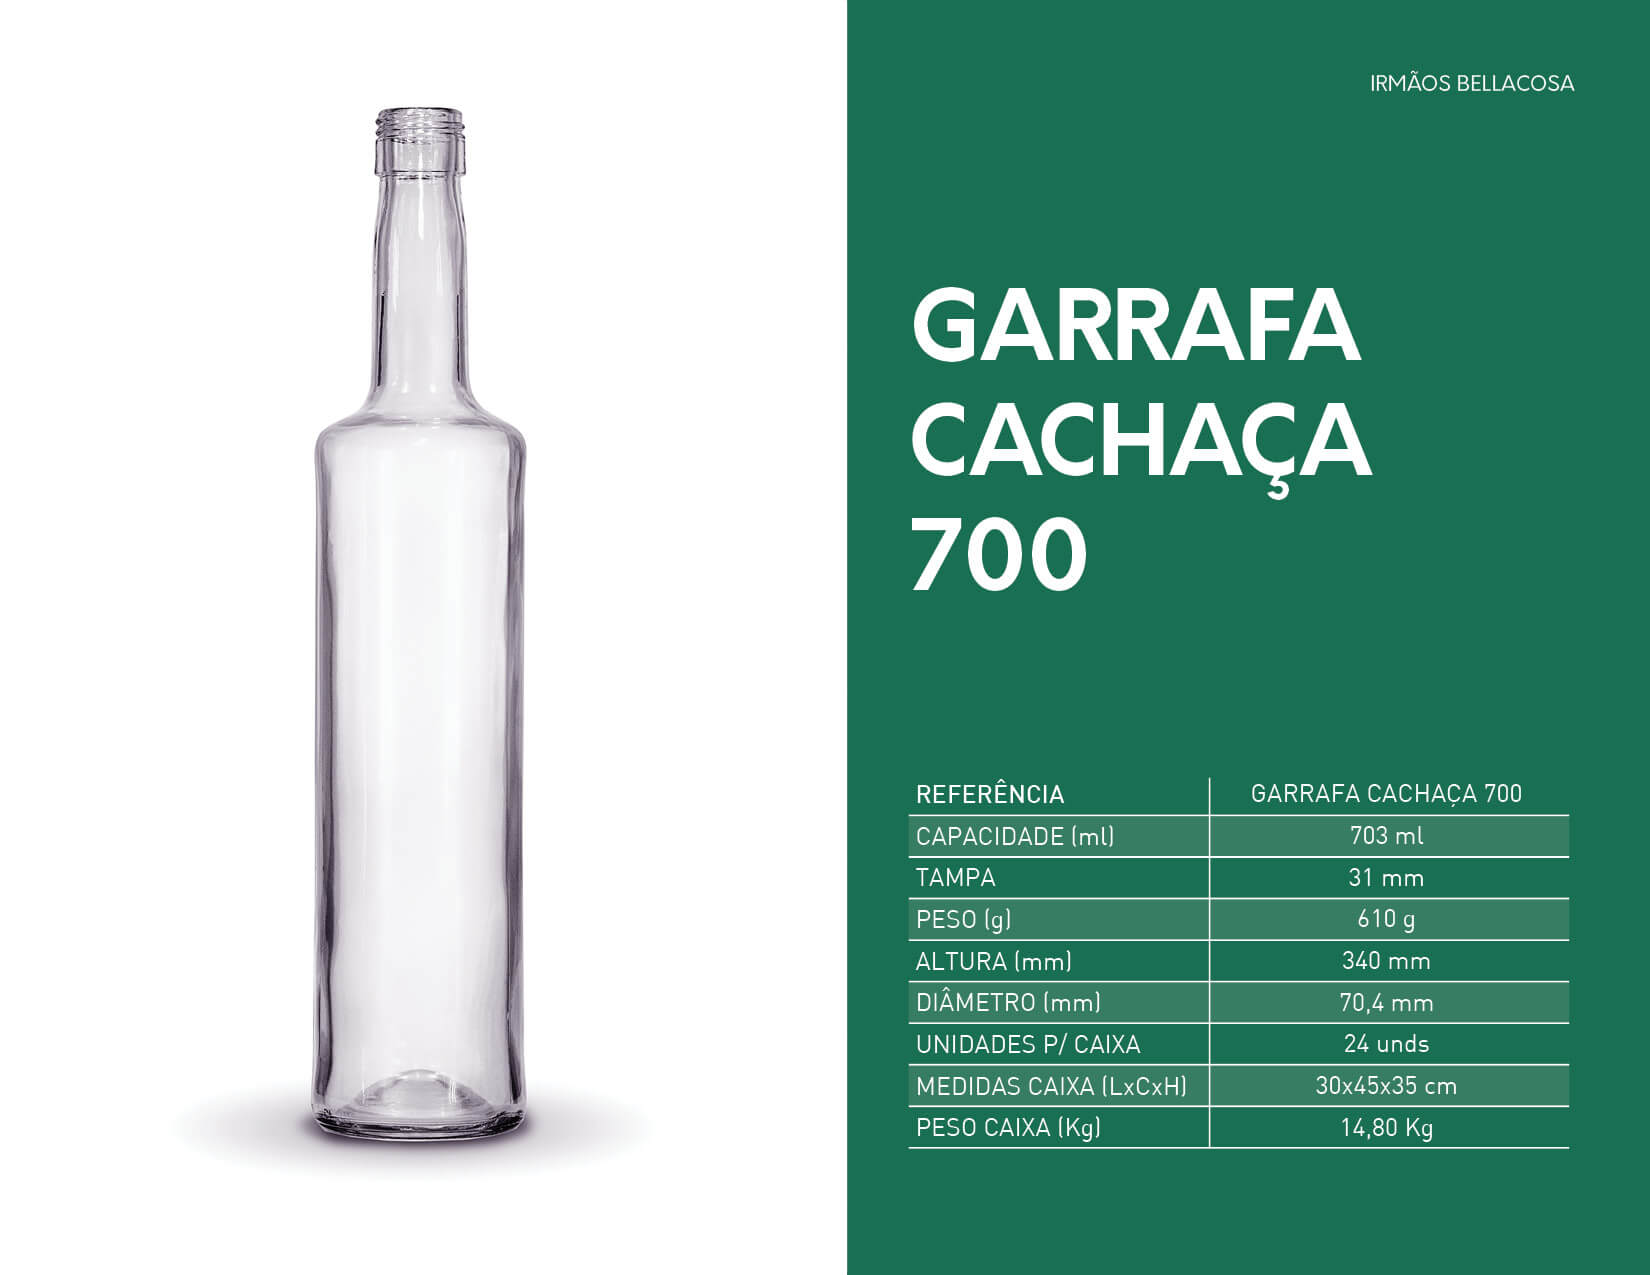 050-Garrafa-cachaca-700-irmaos-bellacosa-embalagens-de-vidro